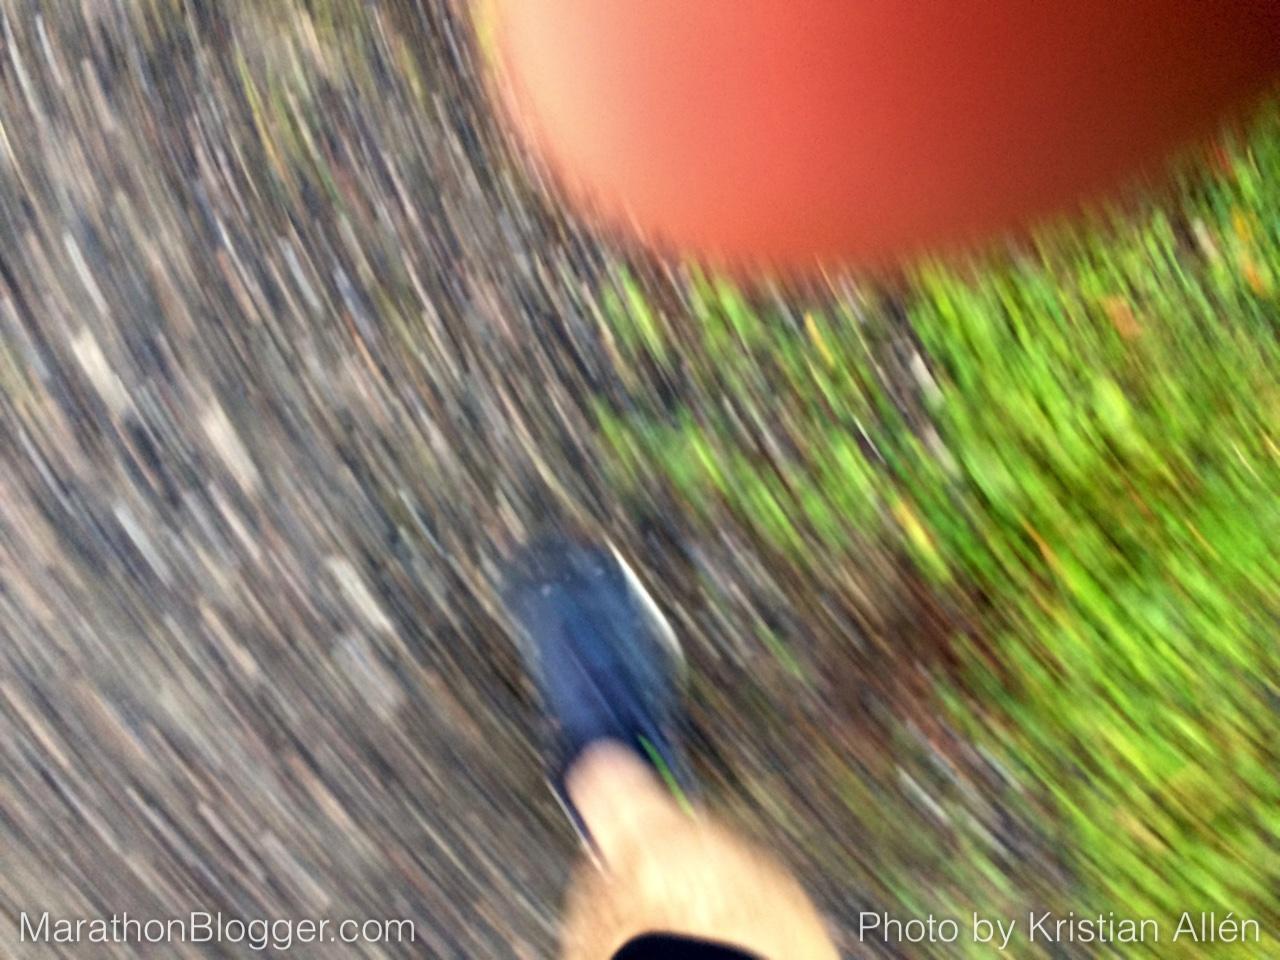 24.9.2015 10.10 km Run